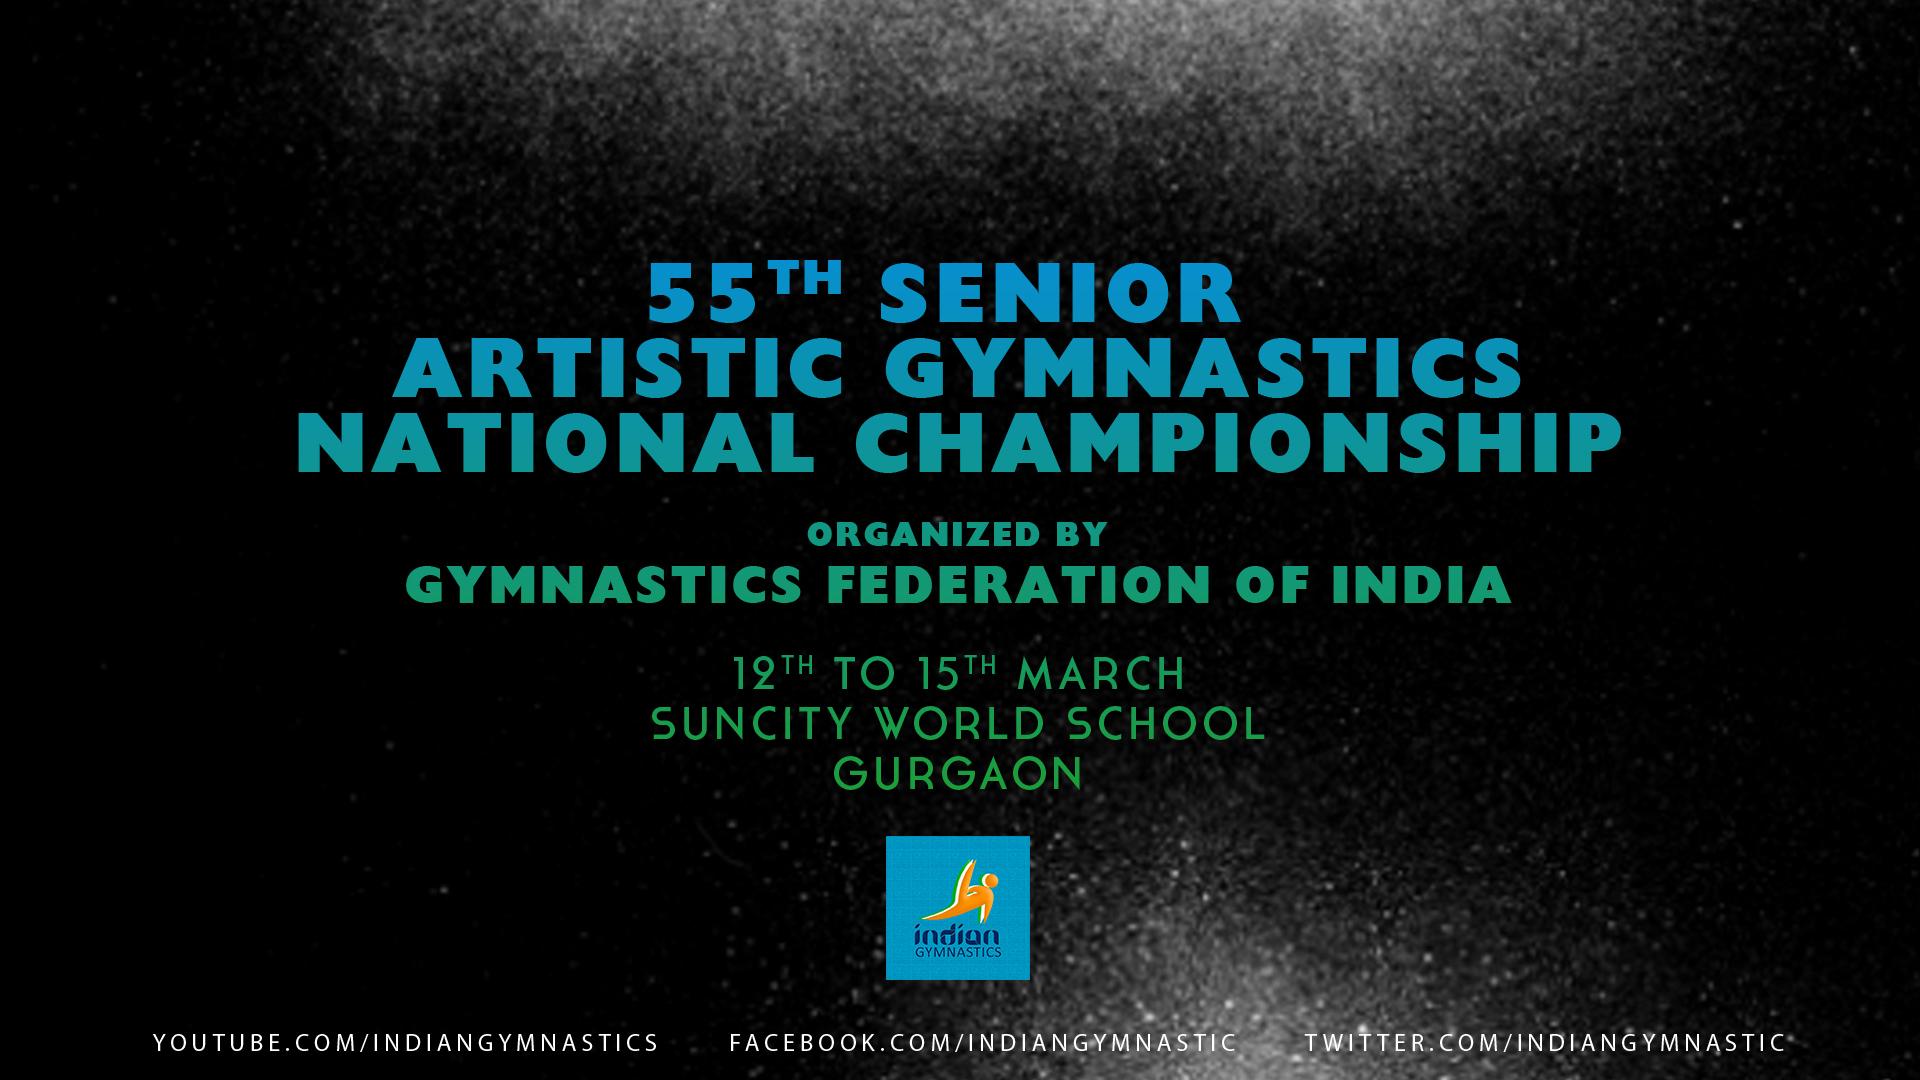 55th Sr. Artistic Gymnastics National Championship | Gurgaon 2016